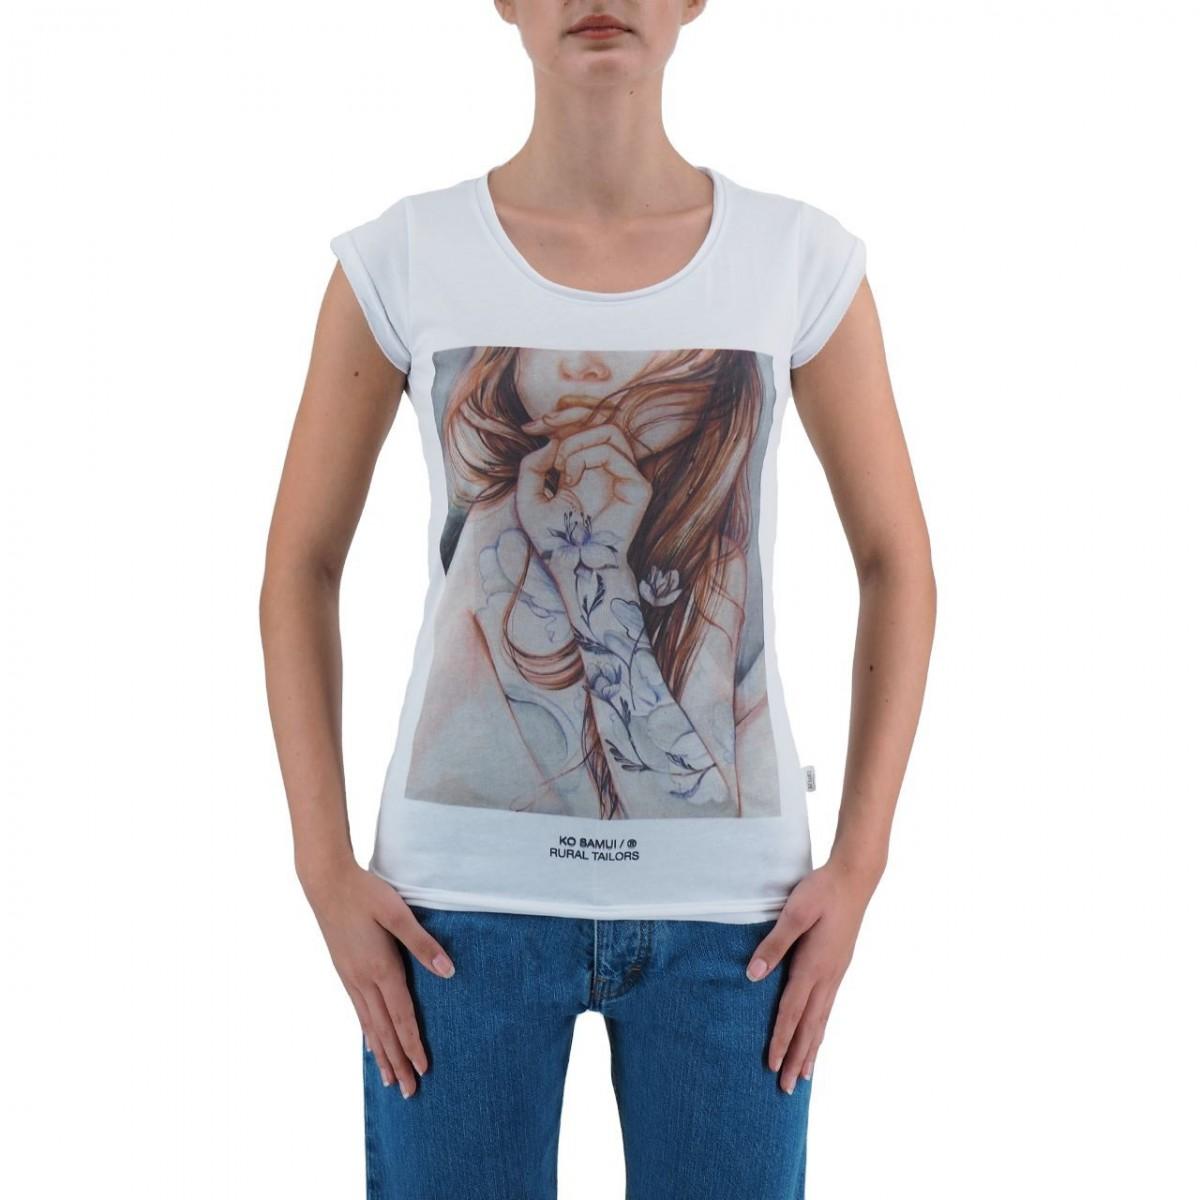 tb439purpleink Shirt Ink Ko Bianco Ksu wht SamuiPurple Sa T mn0wNOv8